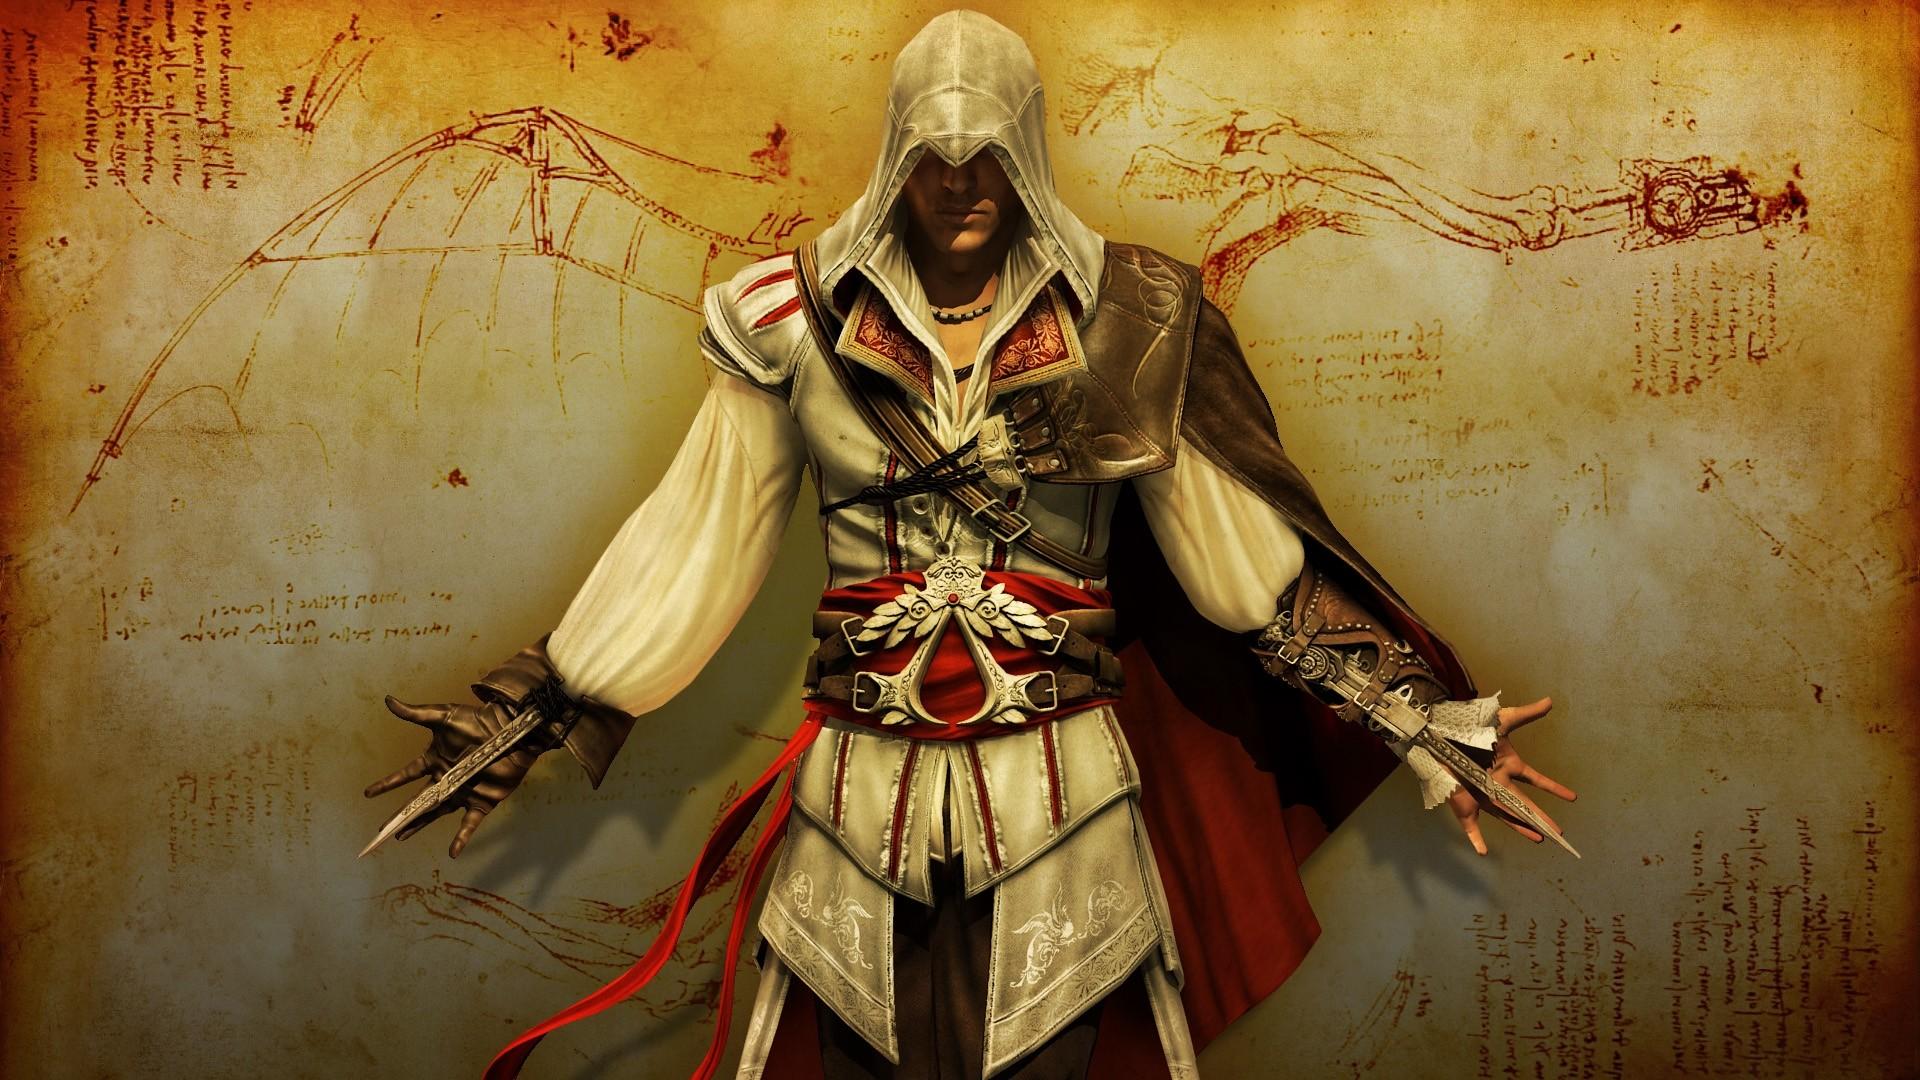 Wallpaper assassins creed revelations, desmond miles, knifes,  hood, drawing